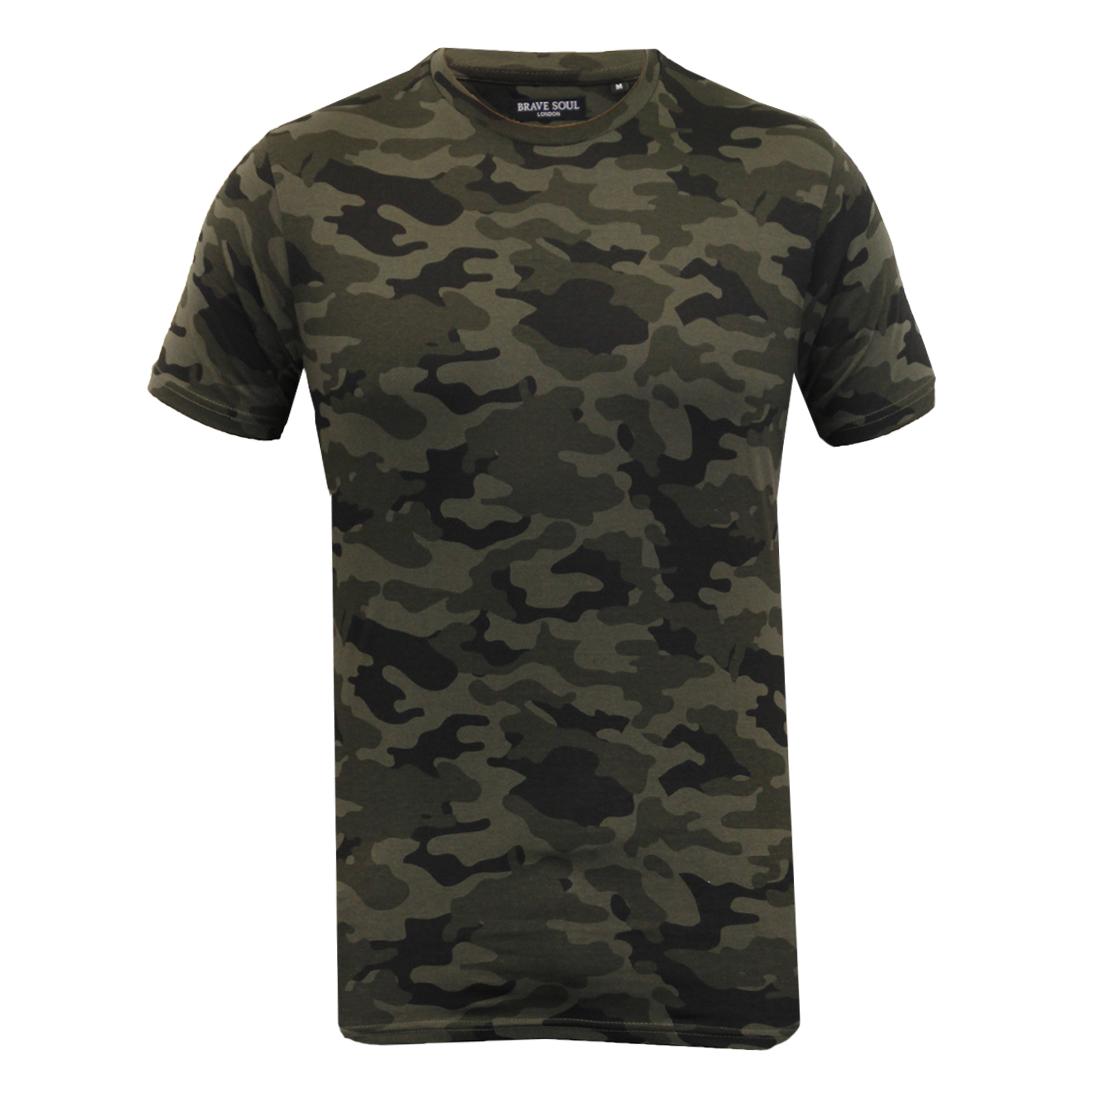 Mens Crew Neck Military Camo Combat Short Sleeve Tee Shirts T-Shirts Tops Blouse